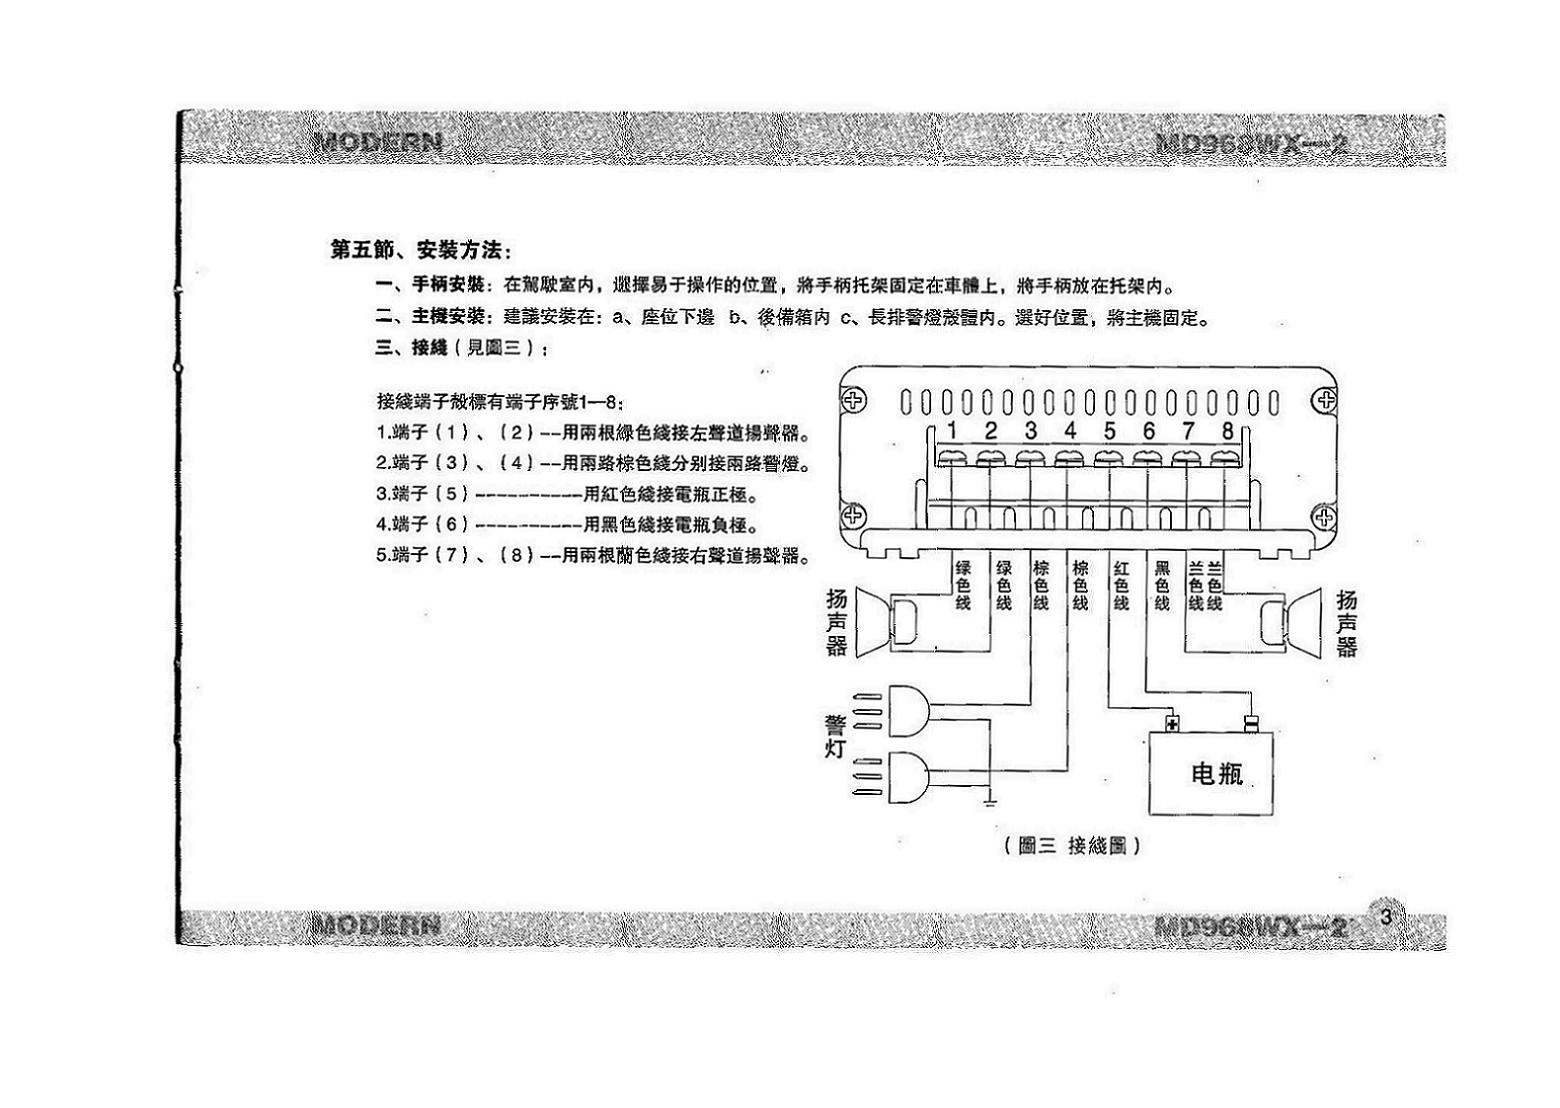 md968wx接线图